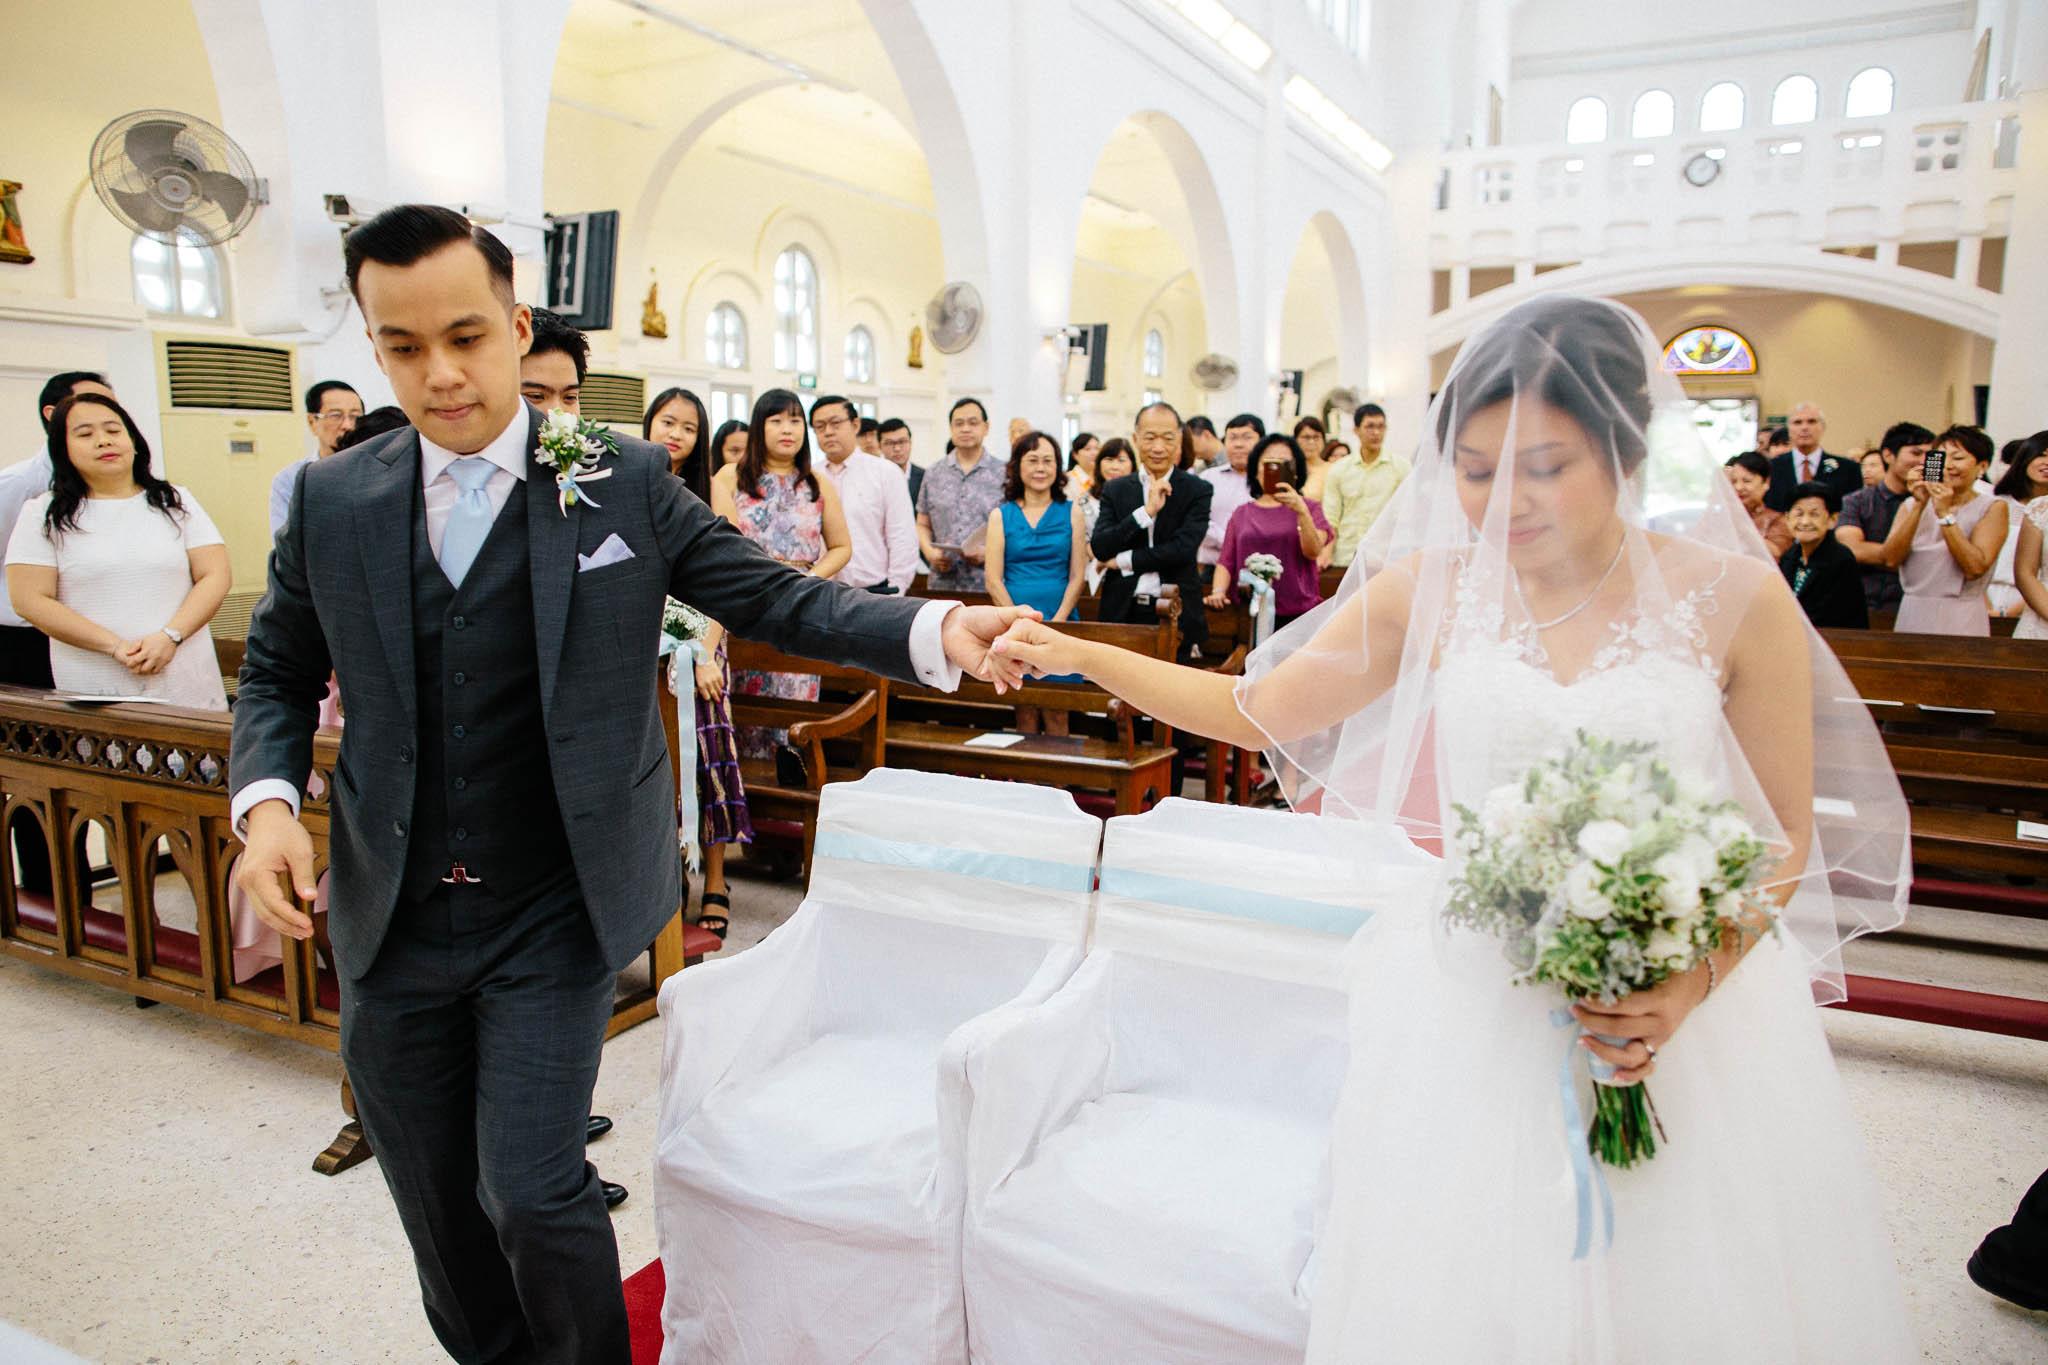 singapore-wedding-photographer-malay-indian-pre-wedding-travel-wmt-2015-jeremy-larissa-29.jpg